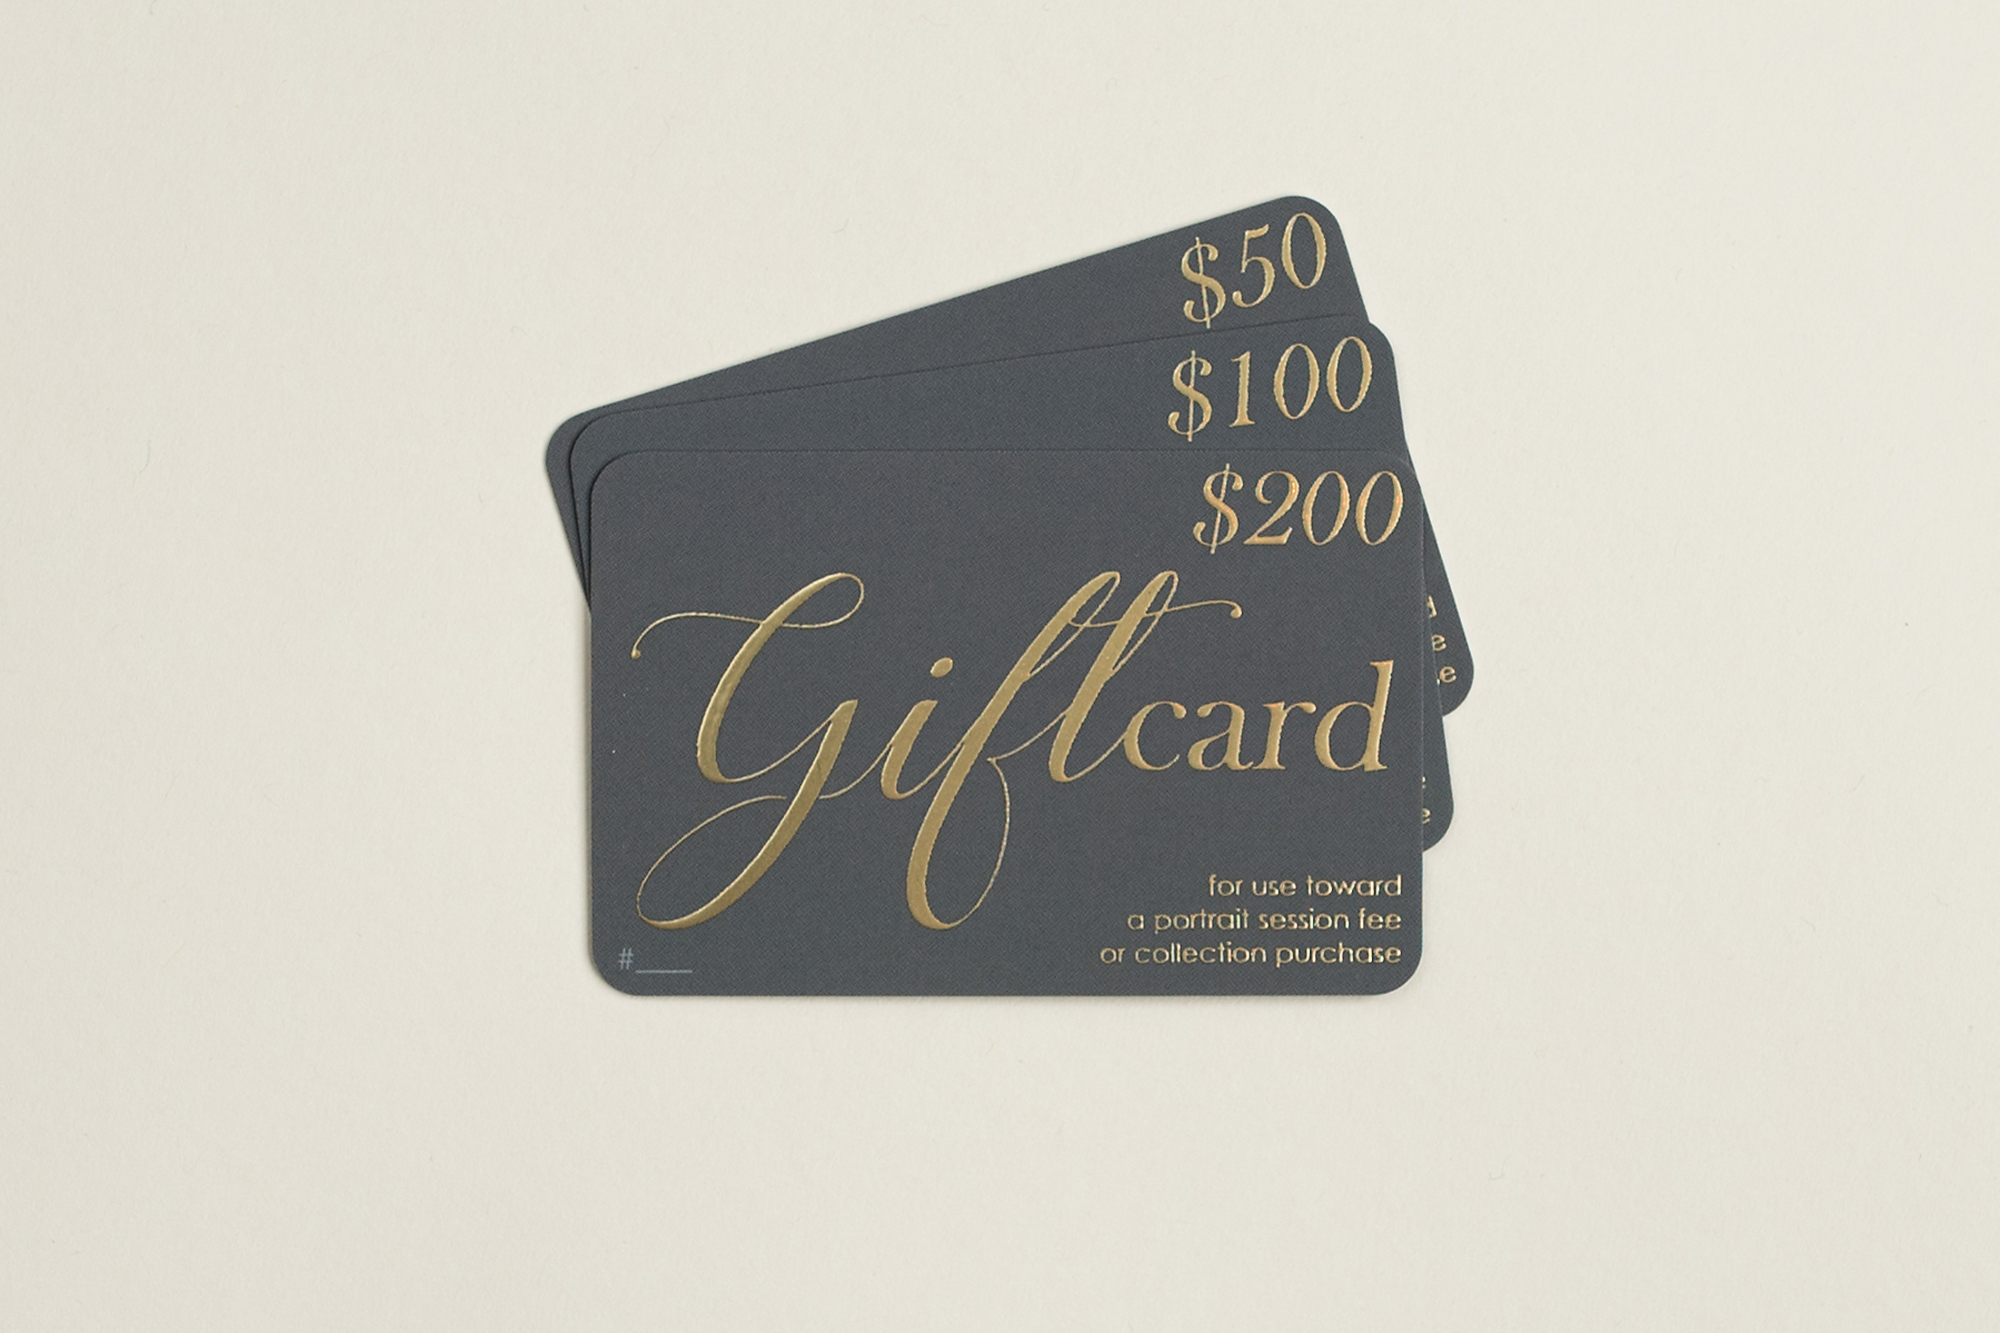 edmonton-portrait-studio-gift-cards.jpg